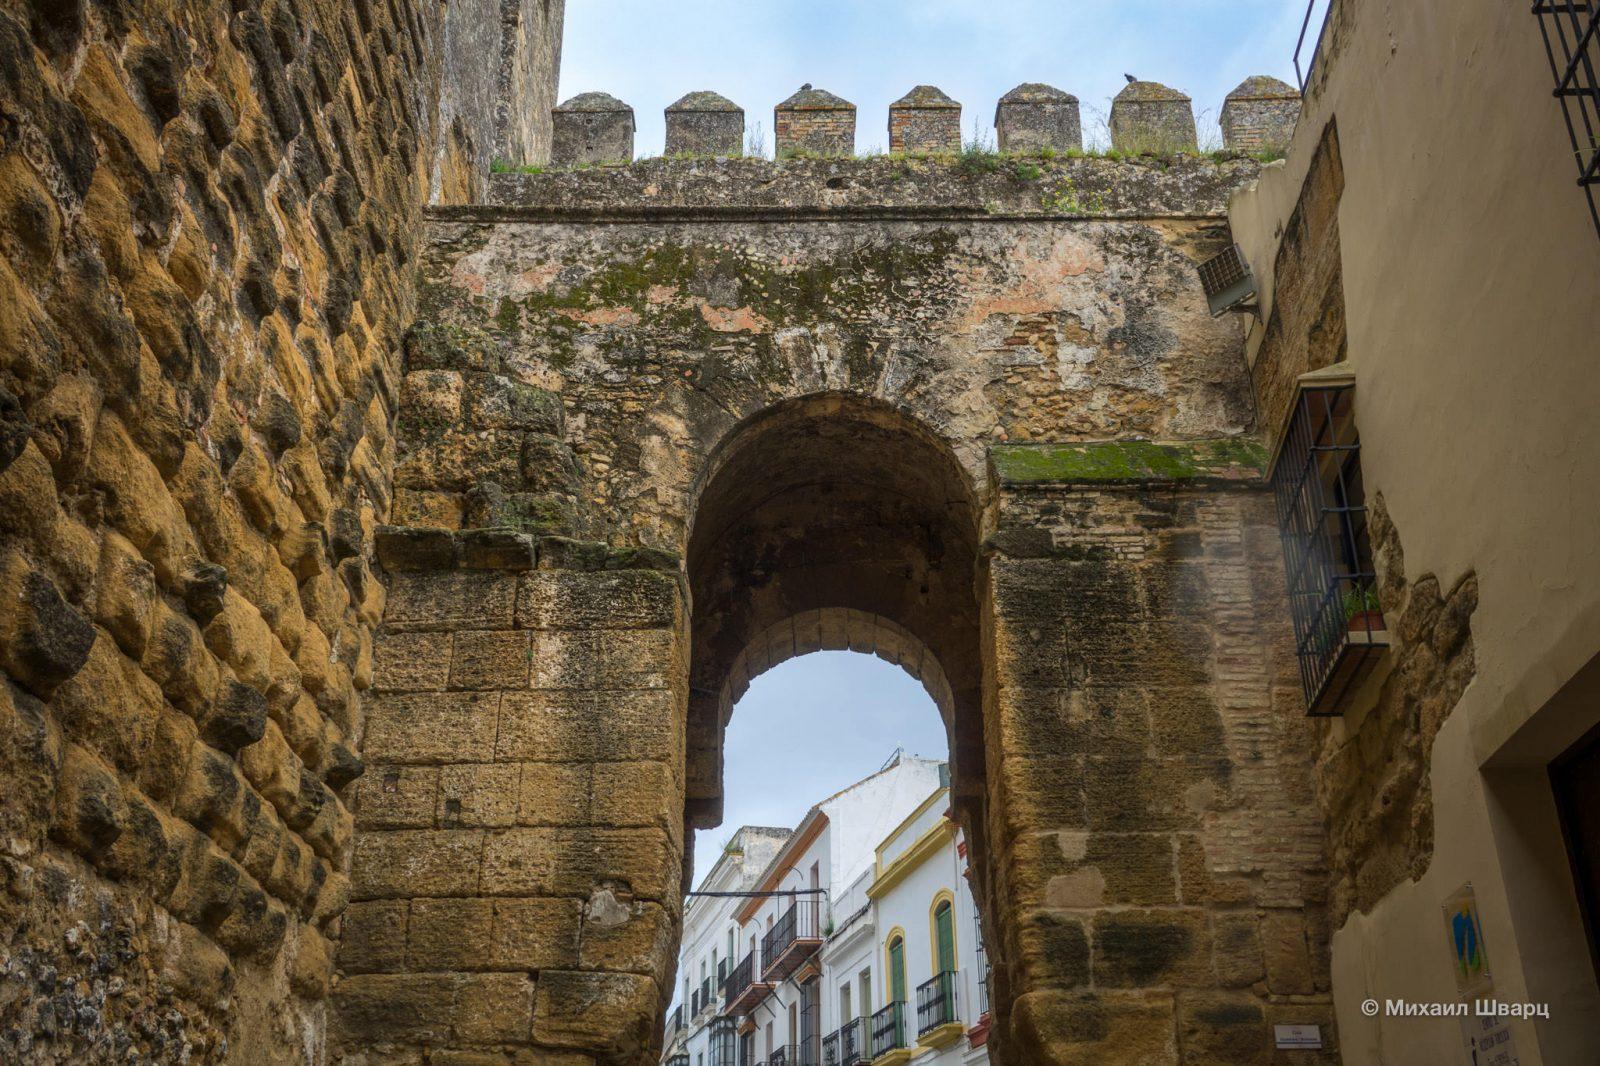 Ворота Севильи